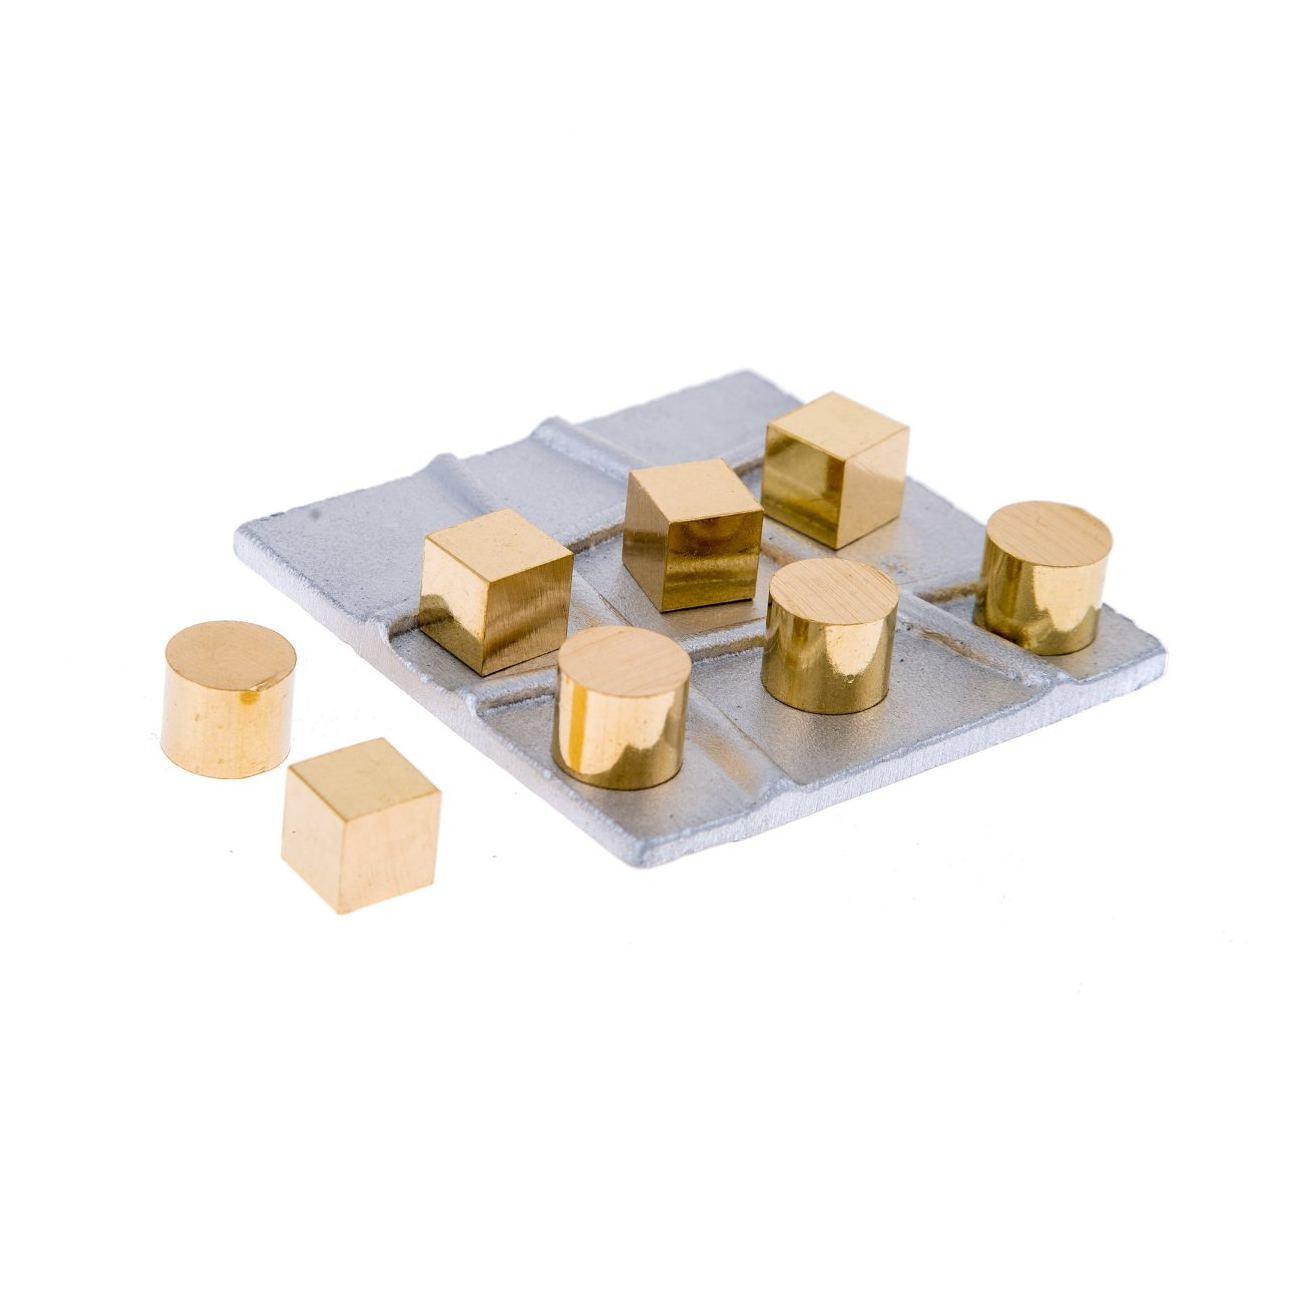 Tic tac toe board game handmade metal decorative ornament for Aluminum decoration